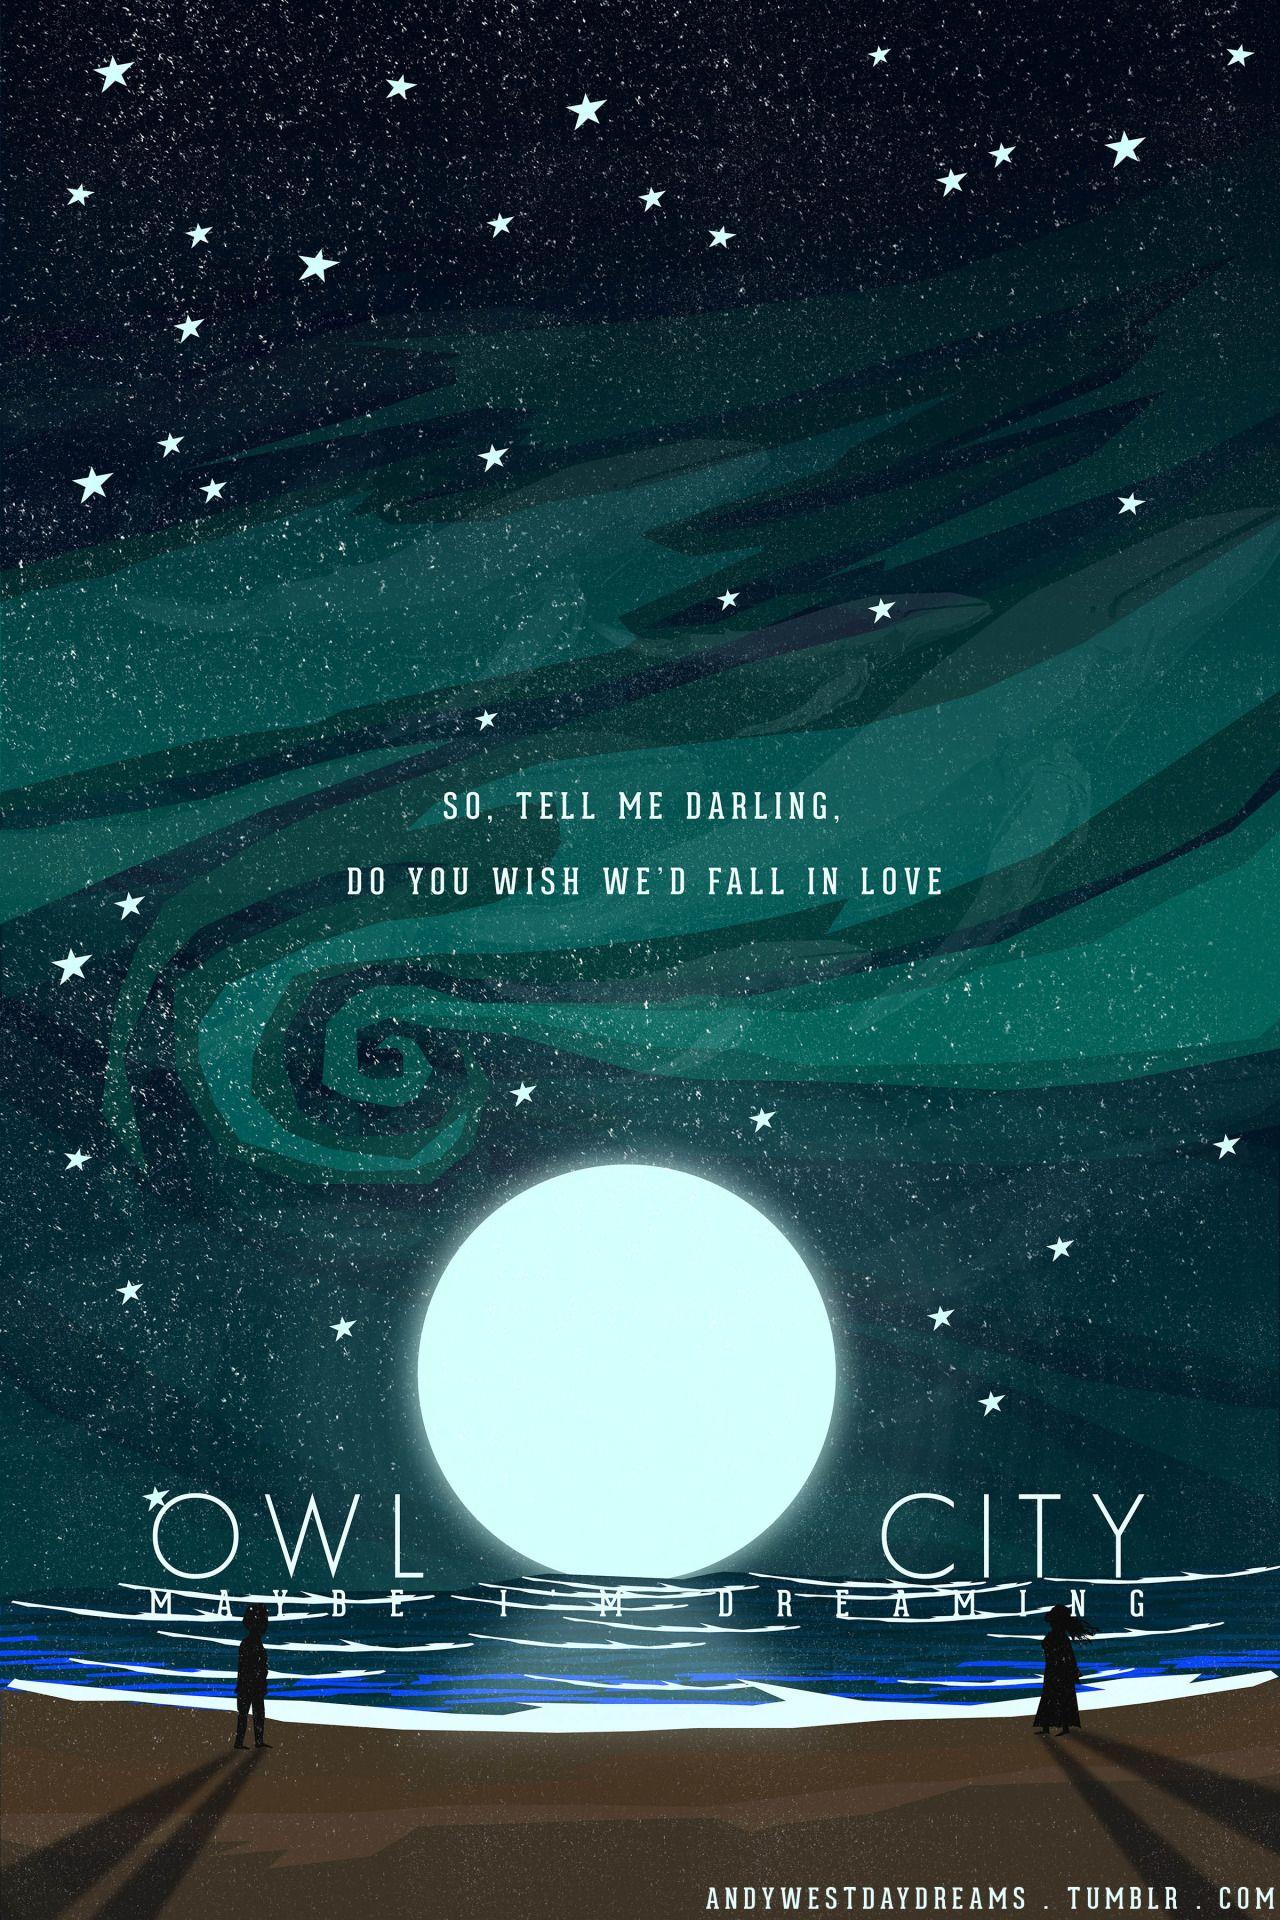 Lyrics From The Saltwater Room By Owl City Owl City Lyrics Owl